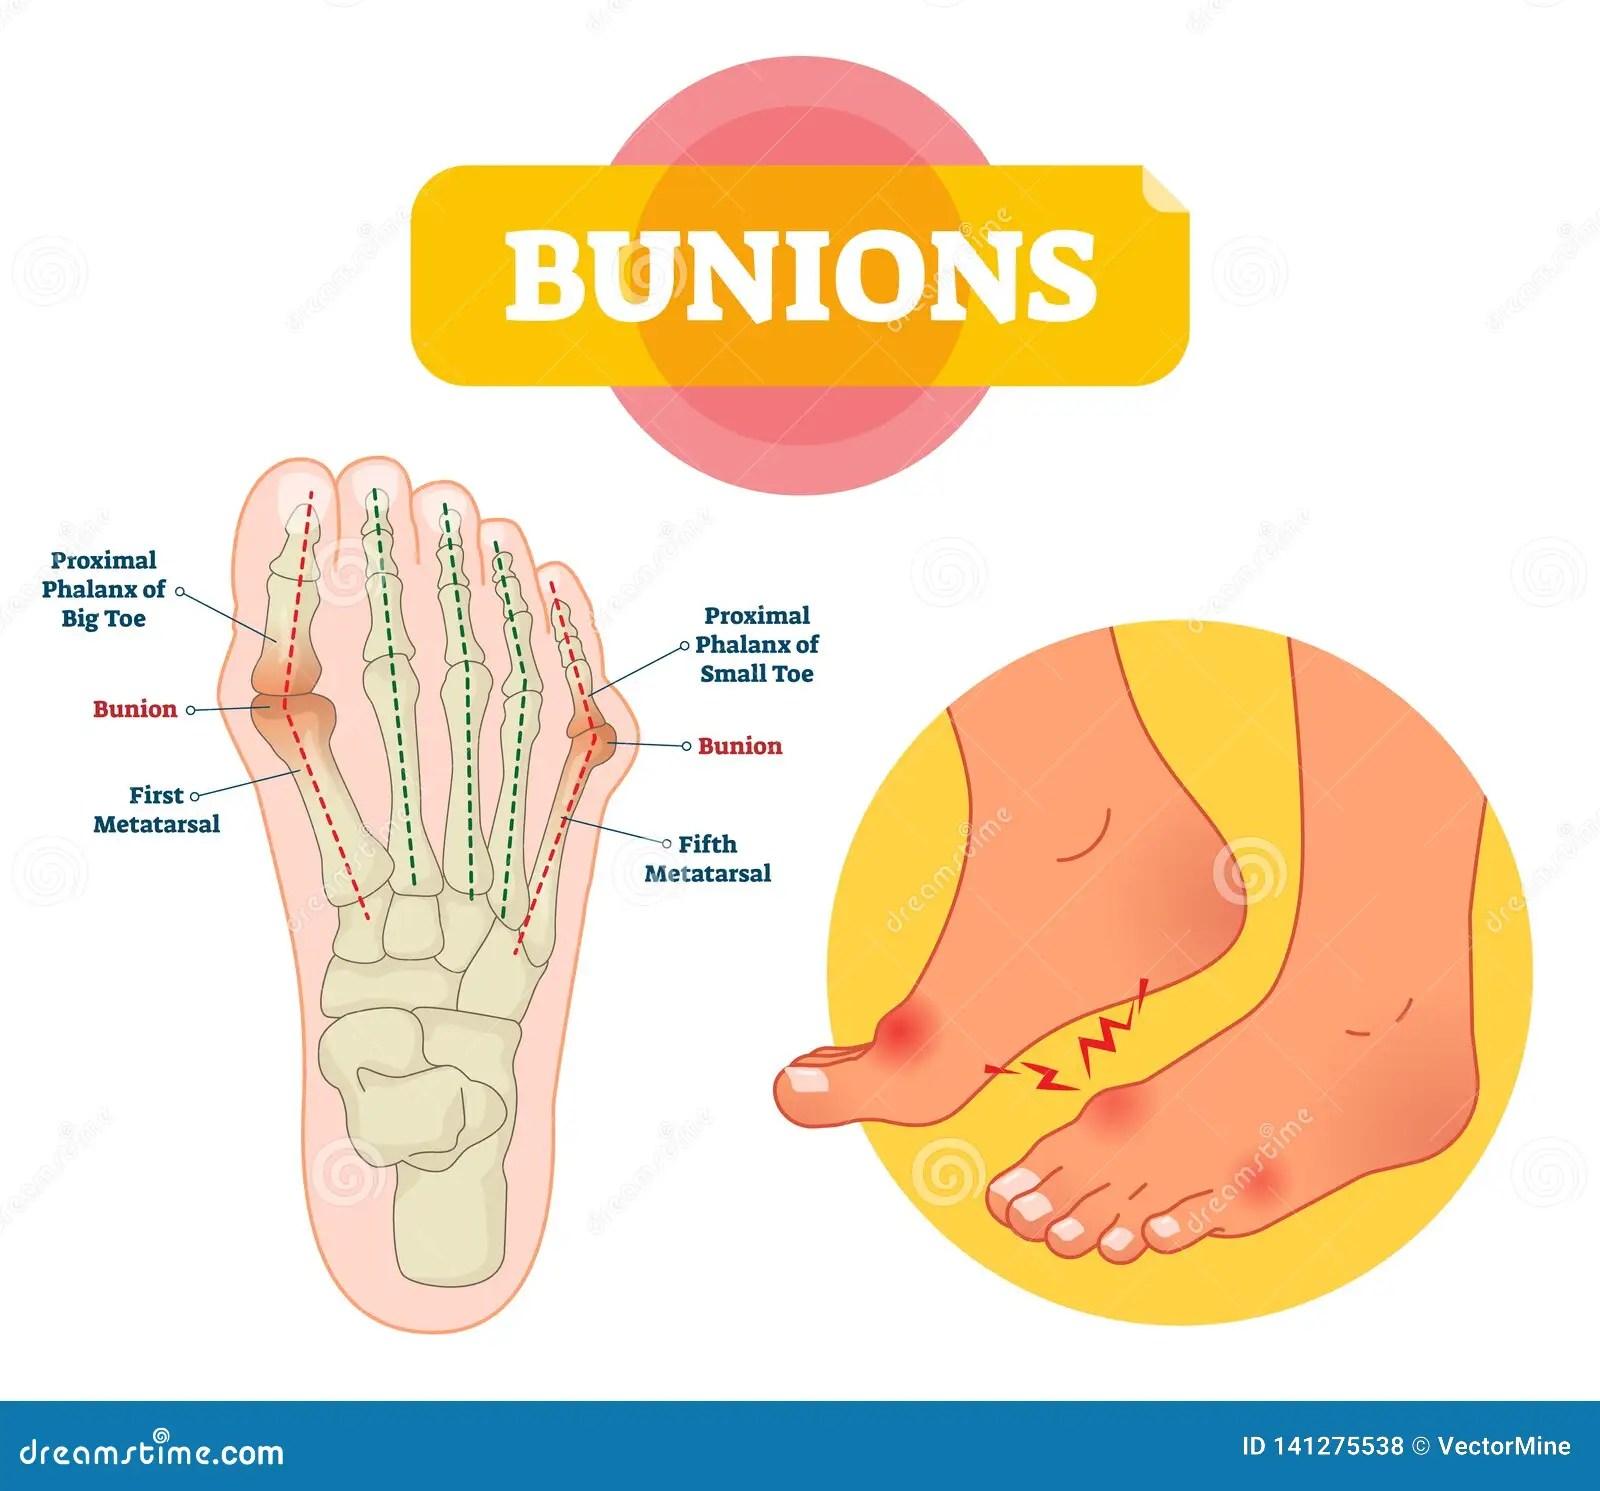 hight resolution of bunions vector illustration labeled feet bone disorder explanation scheme